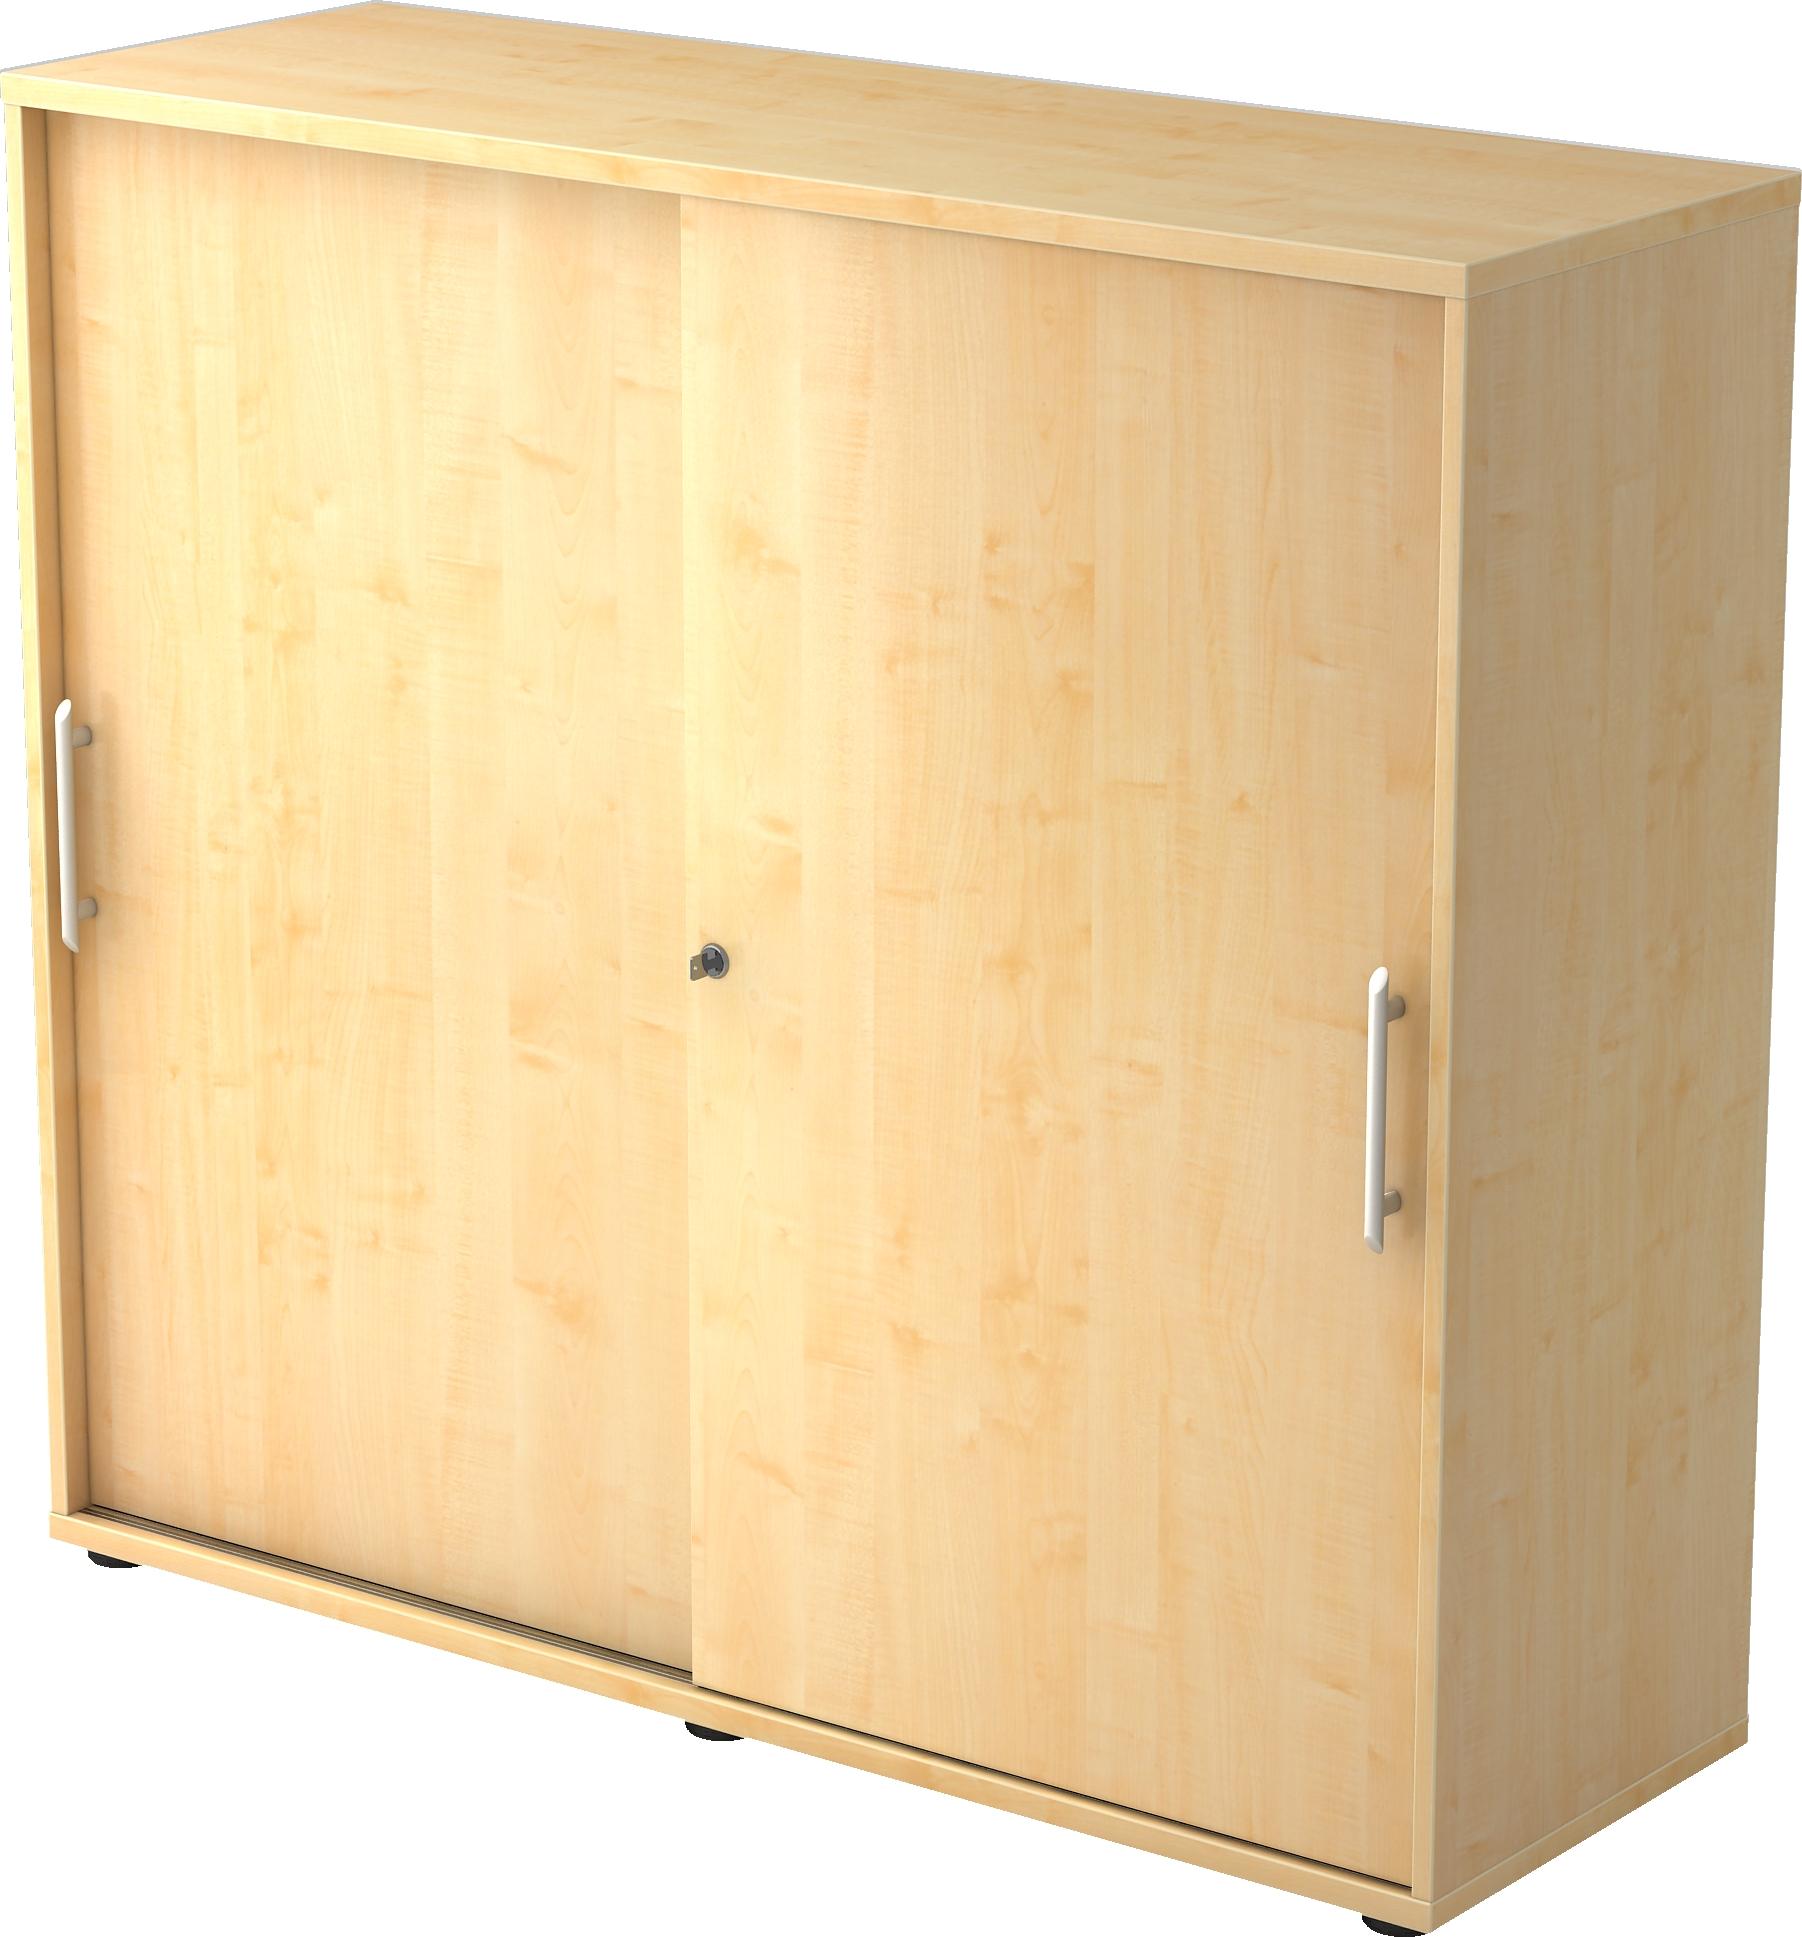 schiebet renschrank b roschrank aktenschrank abschlie bar holz wei buche b m ebay. Black Bedroom Furniture Sets. Home Design Ideas